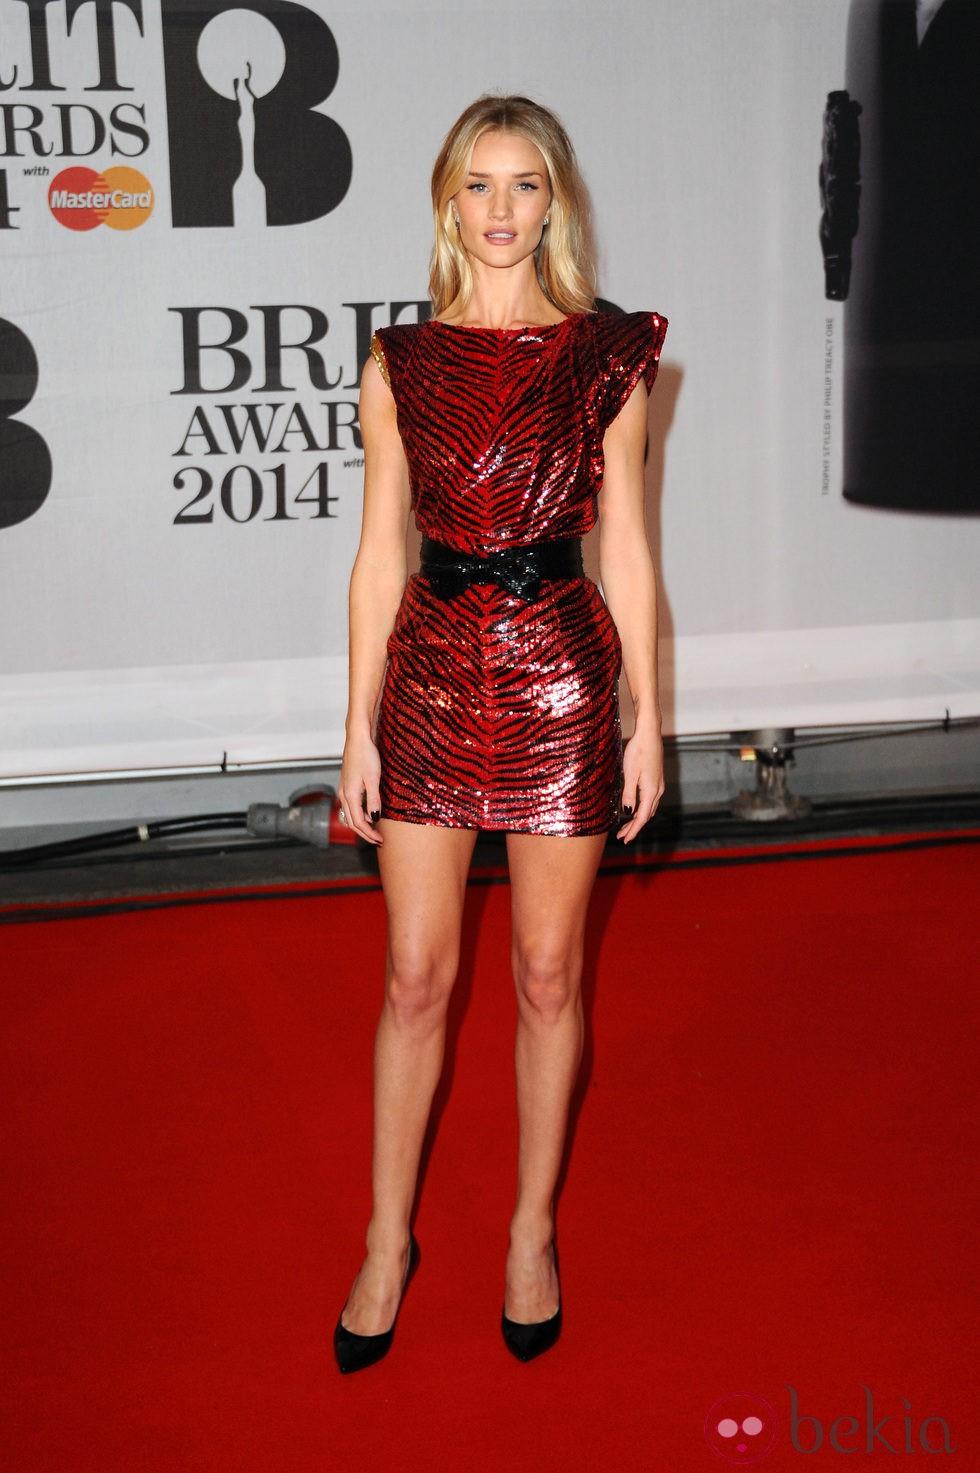 Rosie Huntington-Whiteley en los Brit Awards 2014